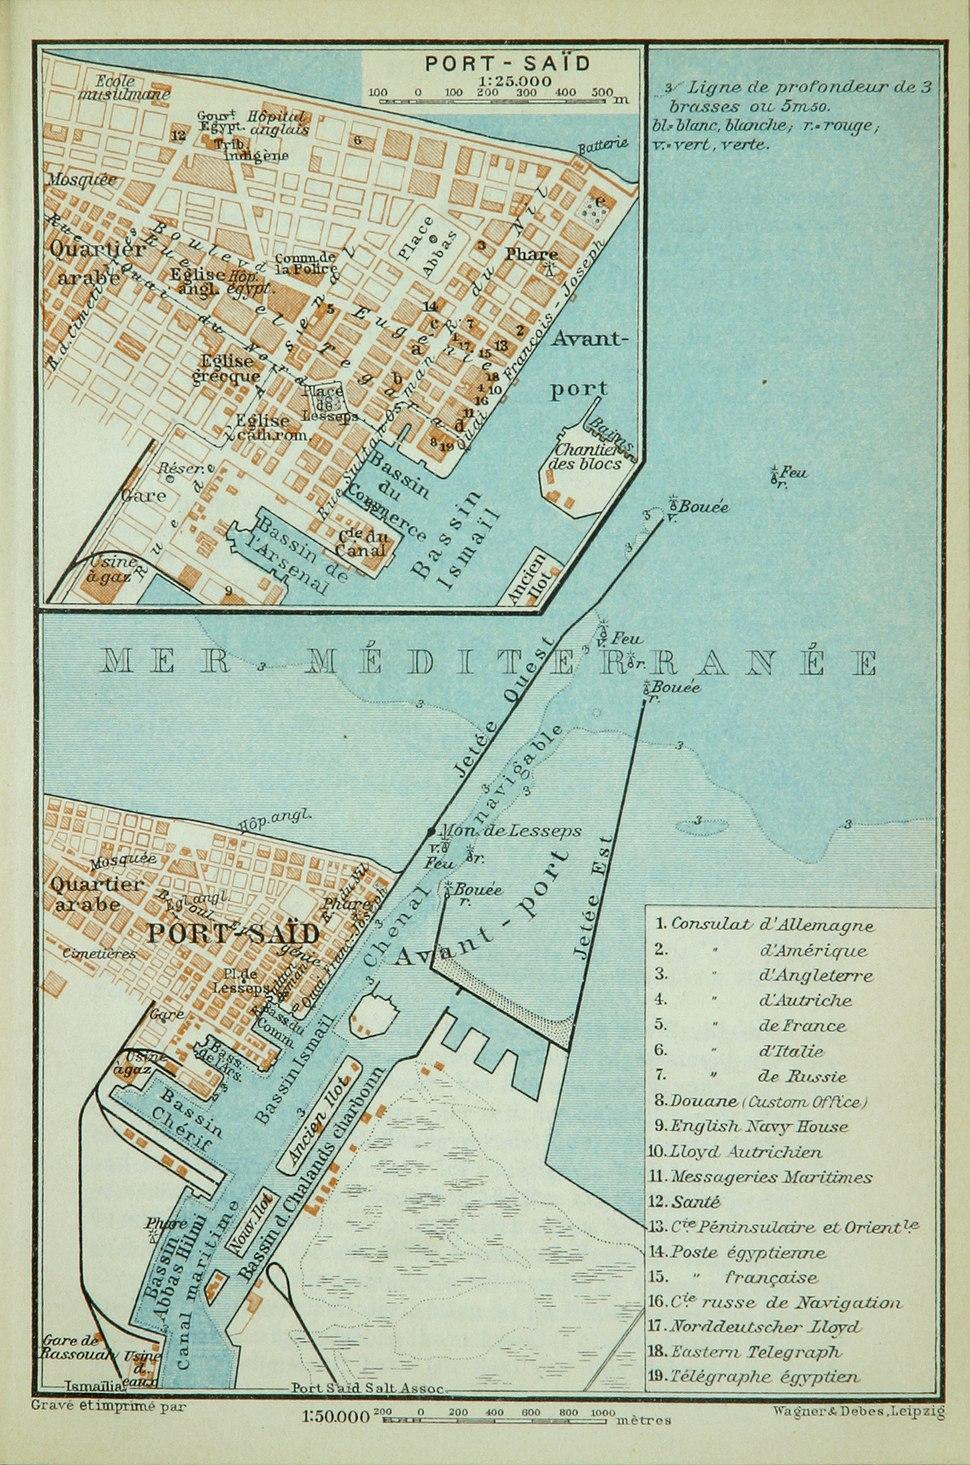 Map of Port Said (Baedeker, 1914)